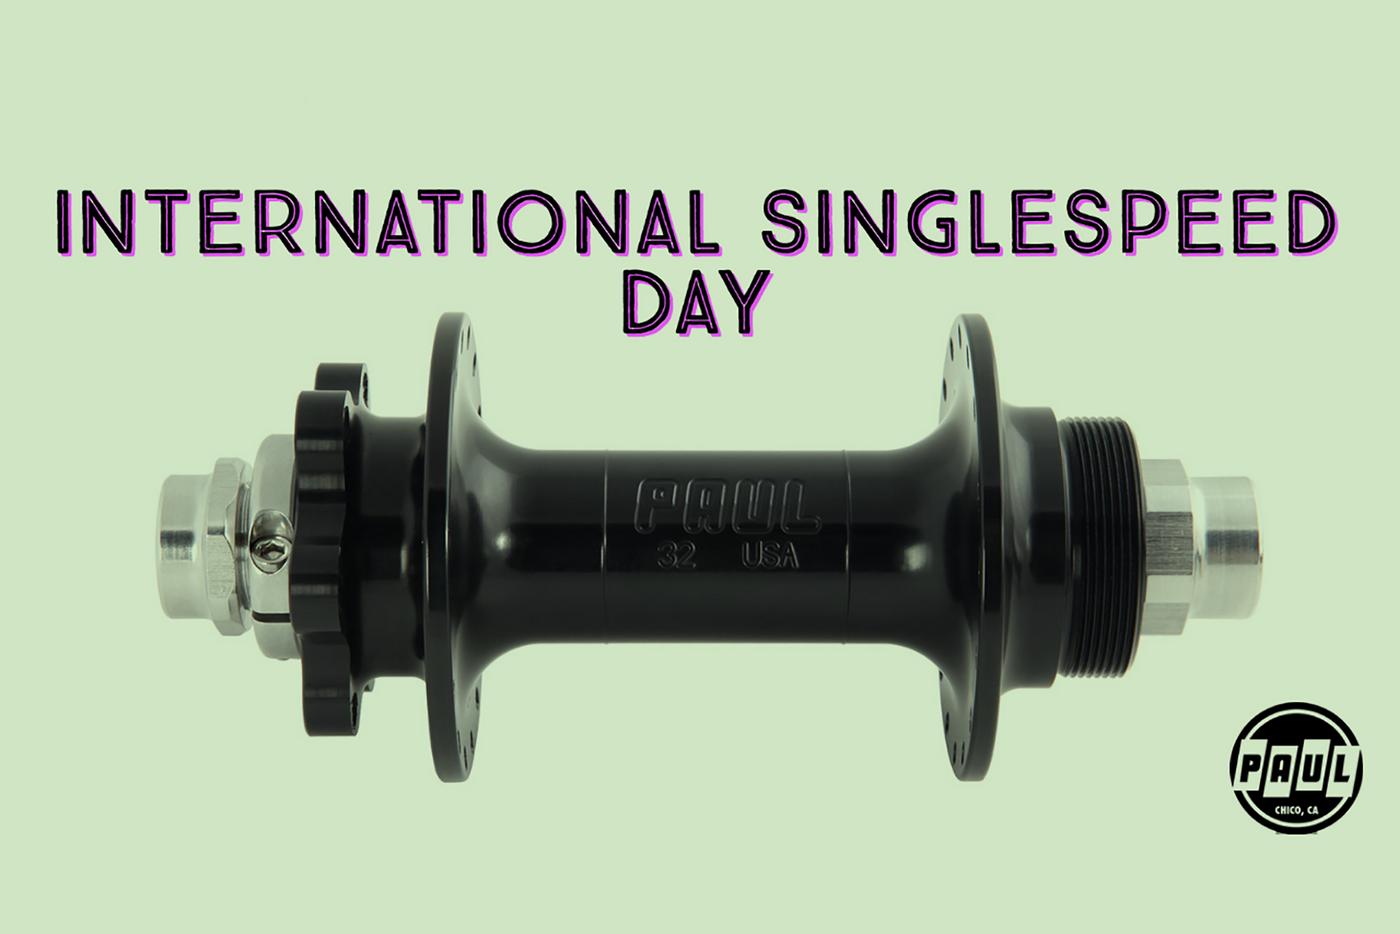 From Henceforth: November 2nd Shall Be International Singlespeed Day